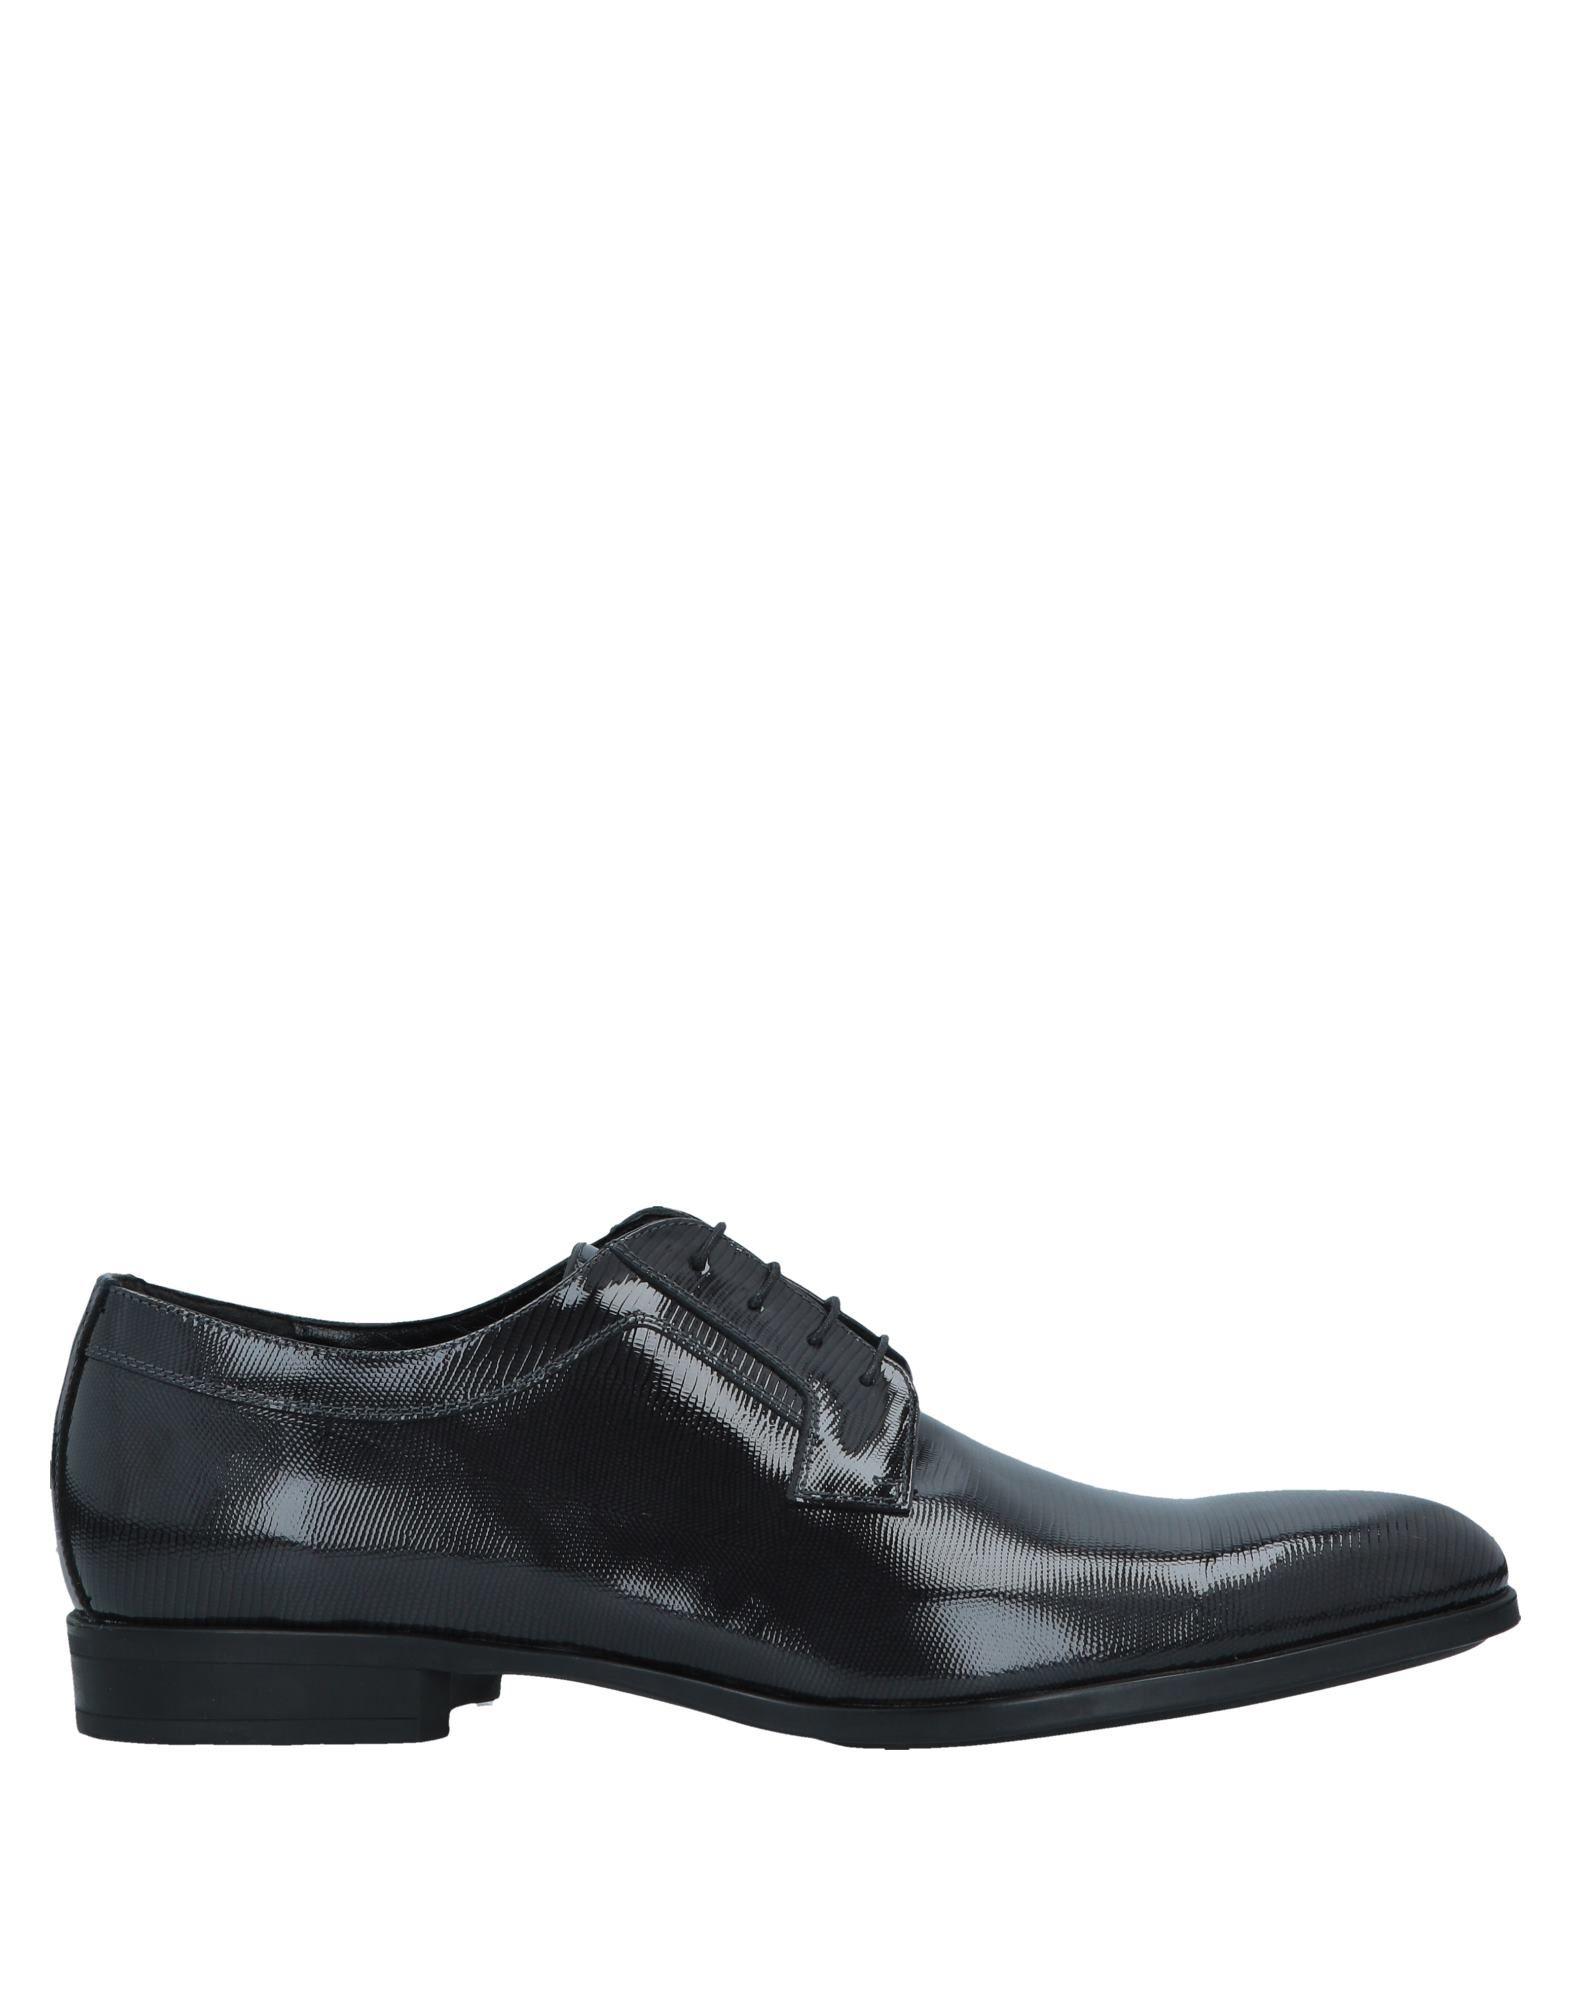 PREMIÈRE MAISON Обувь на шнурках цены онлайн